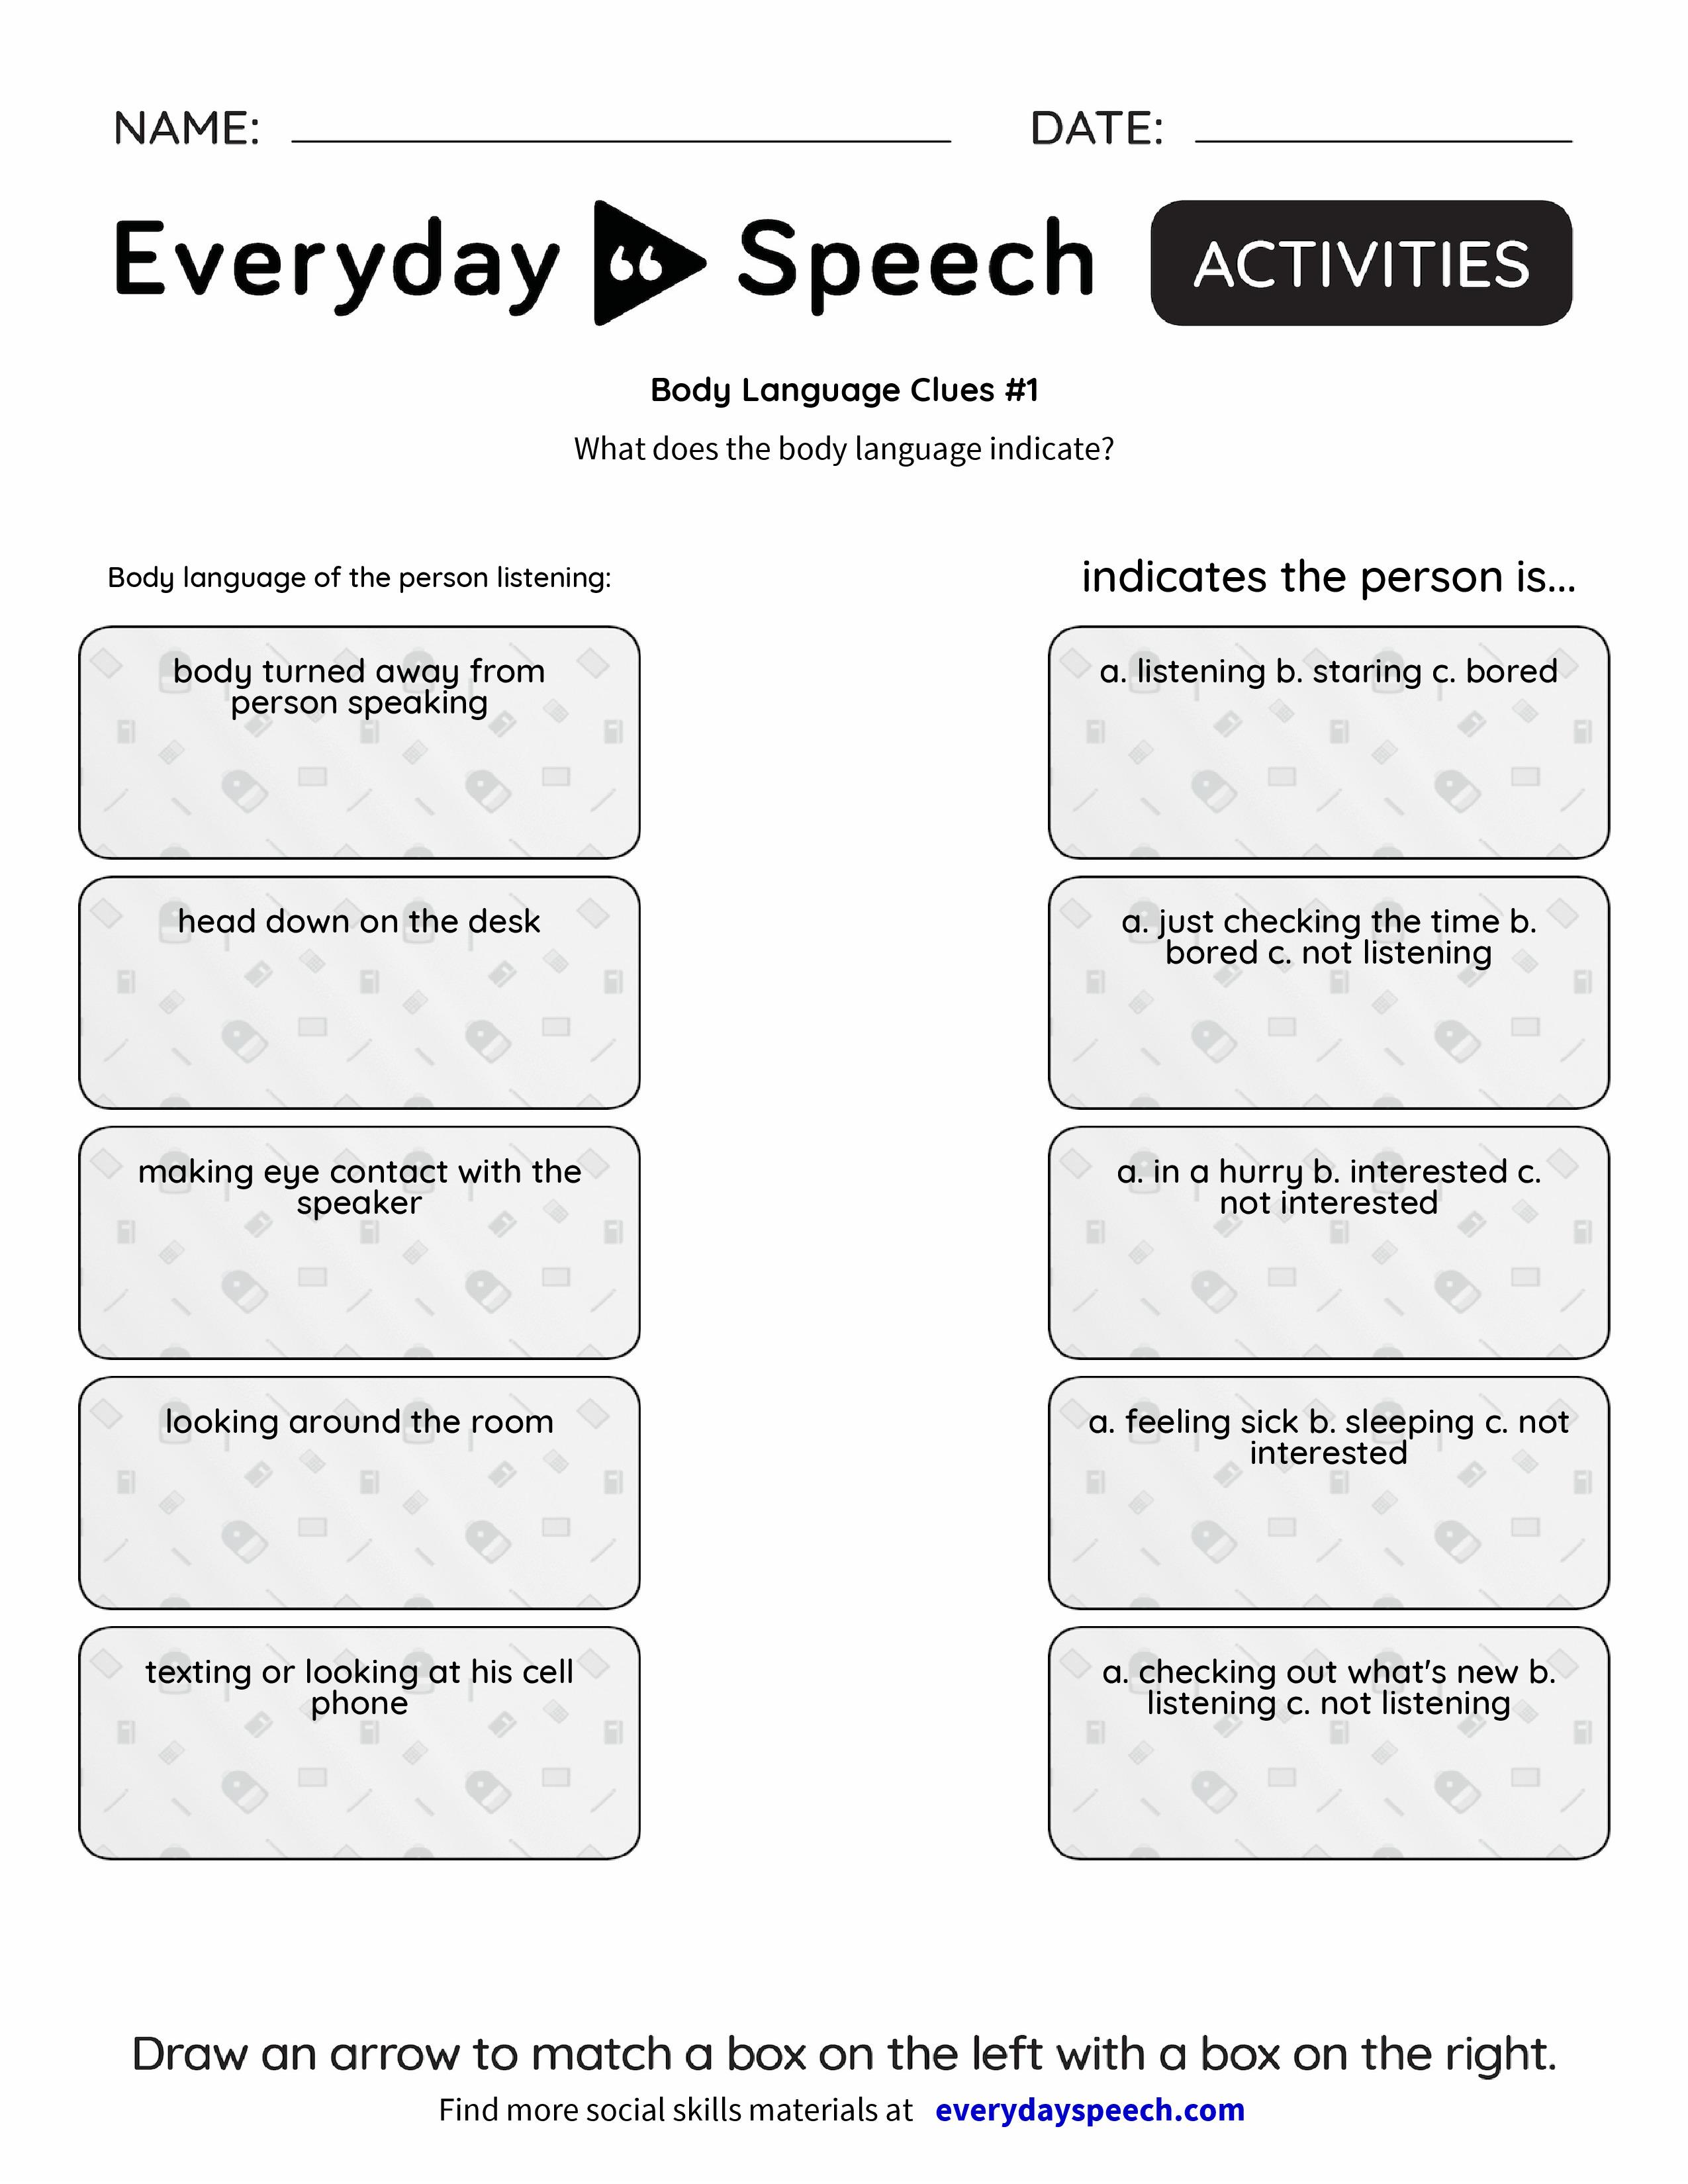 Body Language Clues 1 Everyday Speech Everyday Speech